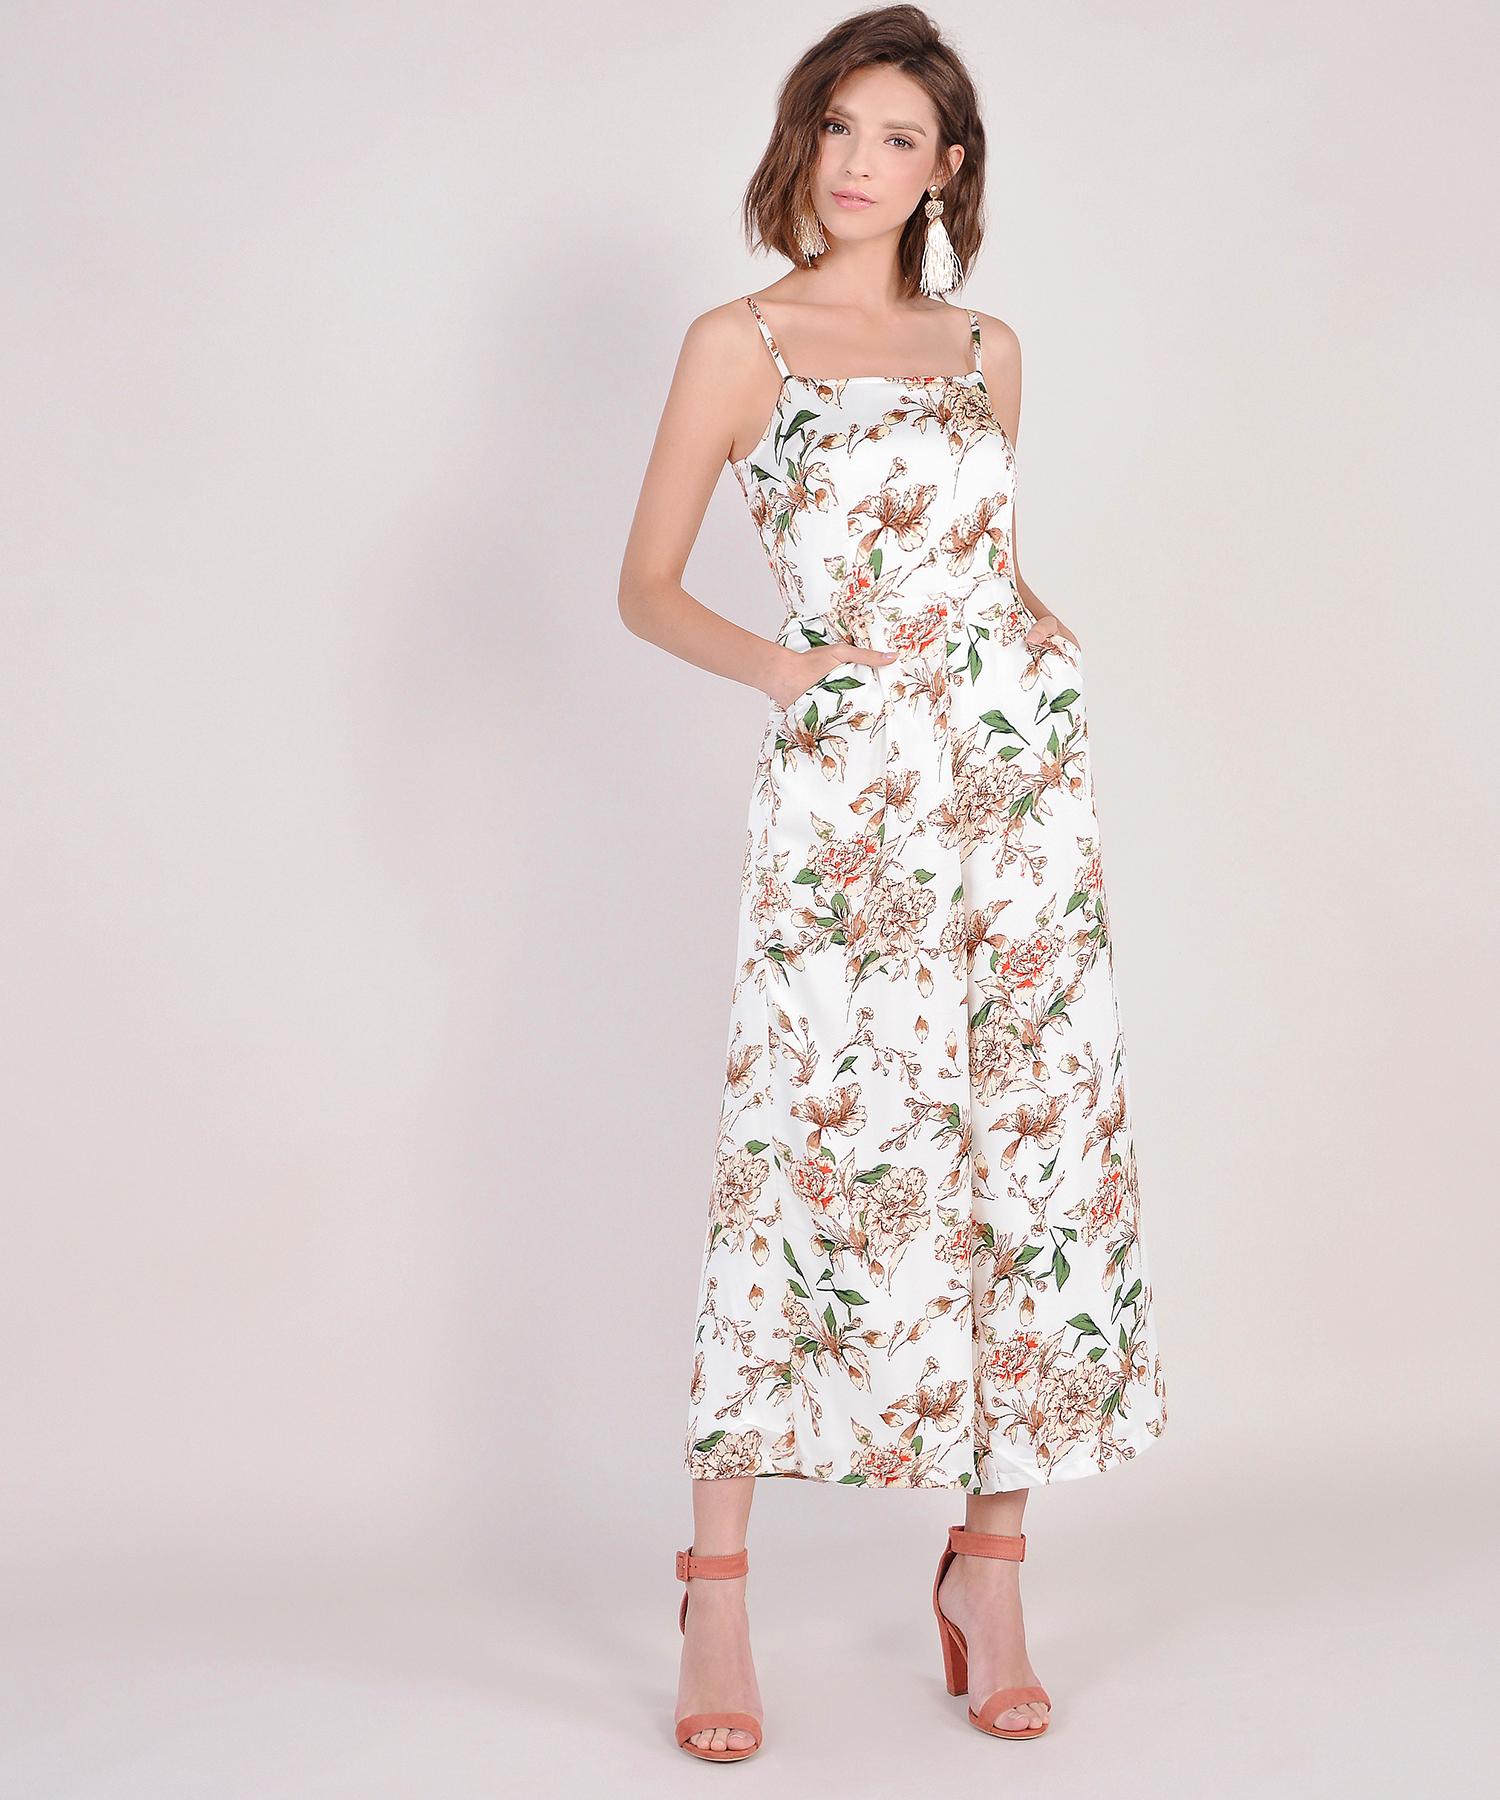 fb76861095c Glossier Floral Jumpsuit - White